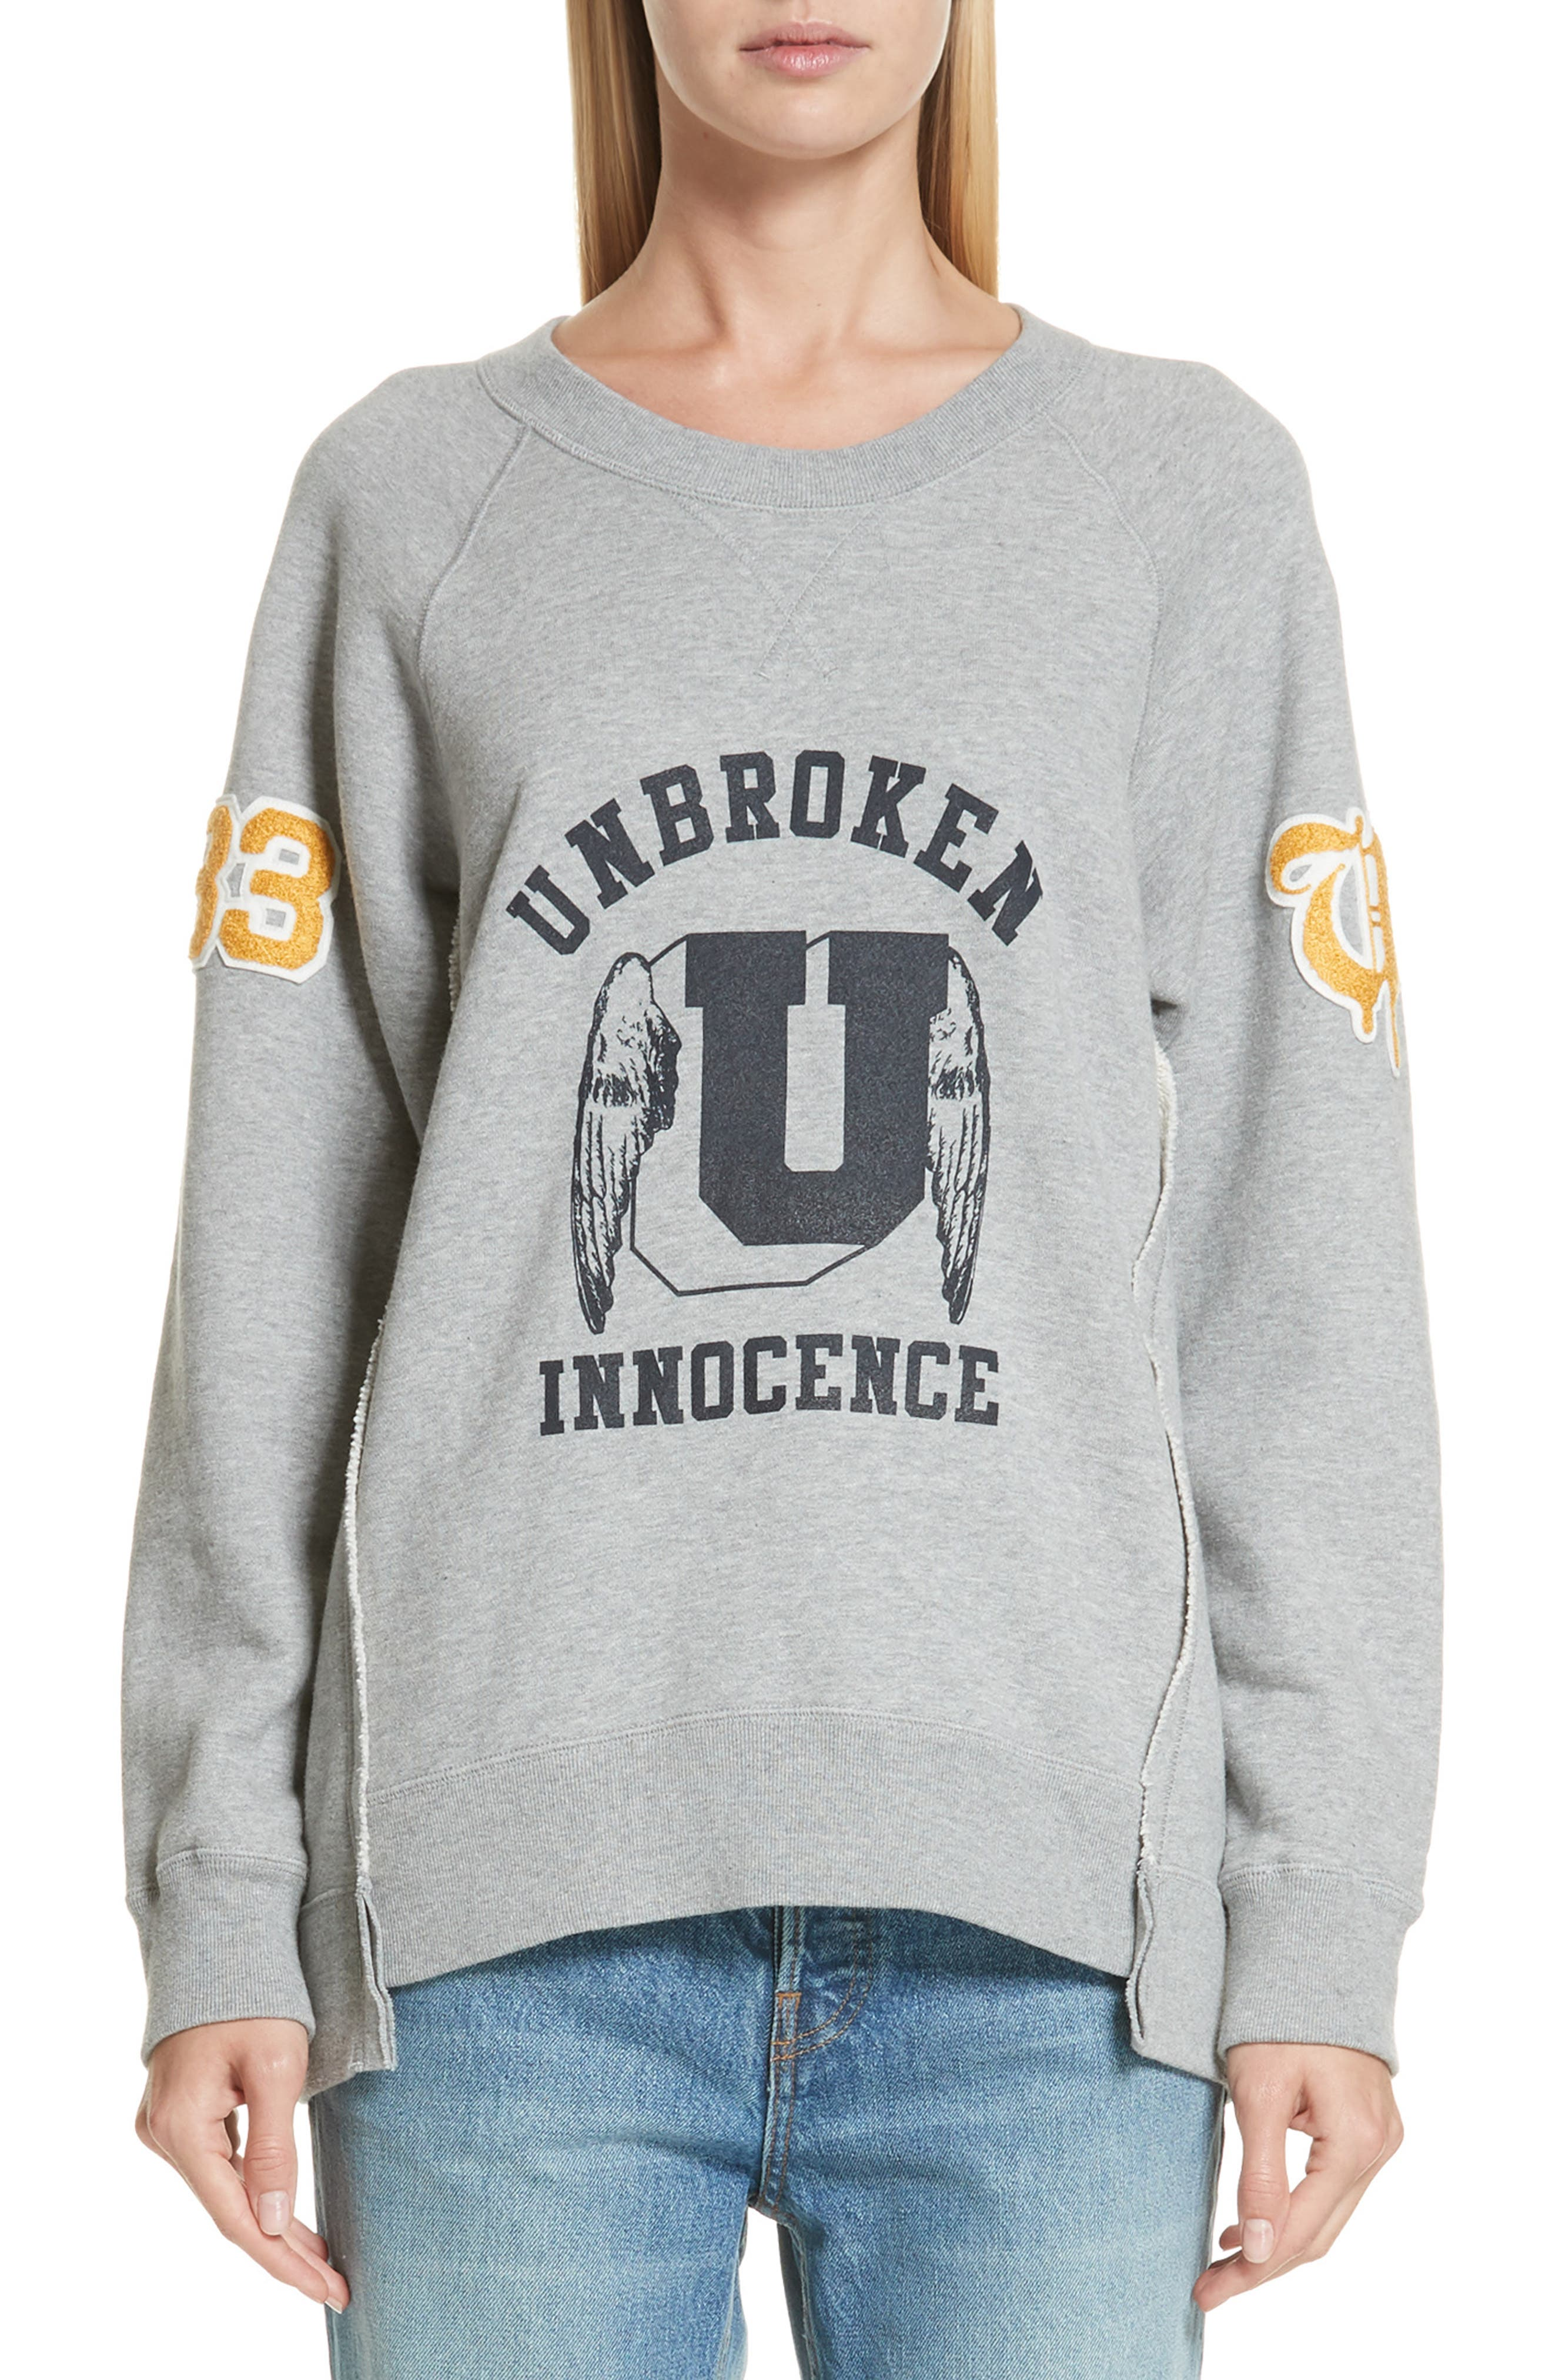 Unbroken Innocence Sweatshirt,                             Main thumbnail 1, color,                             B TOP GRAY